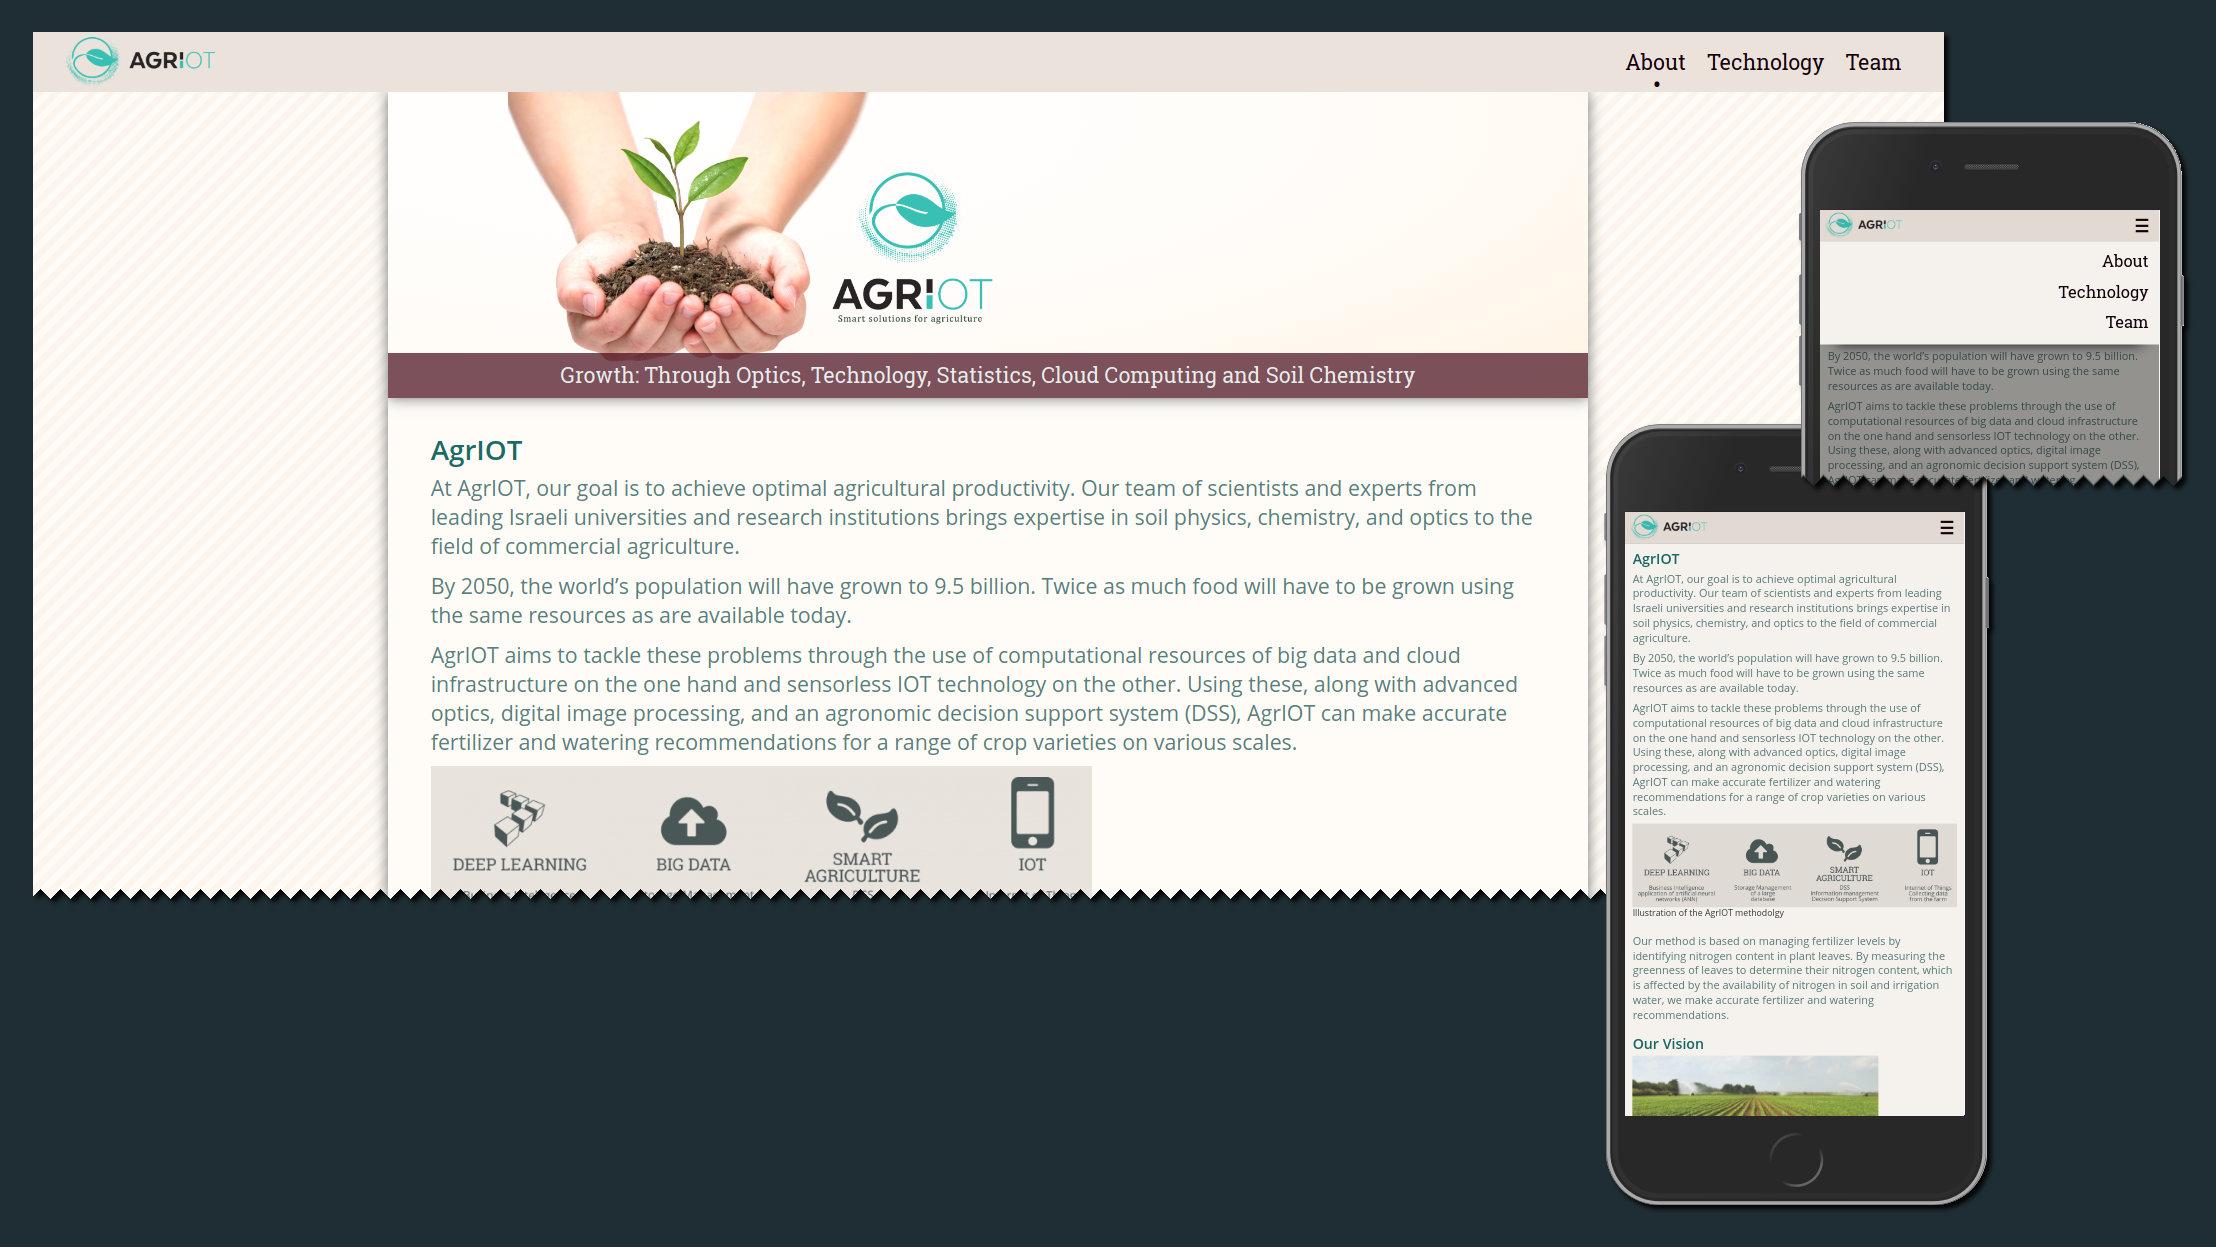 AgrIOT website's landing page